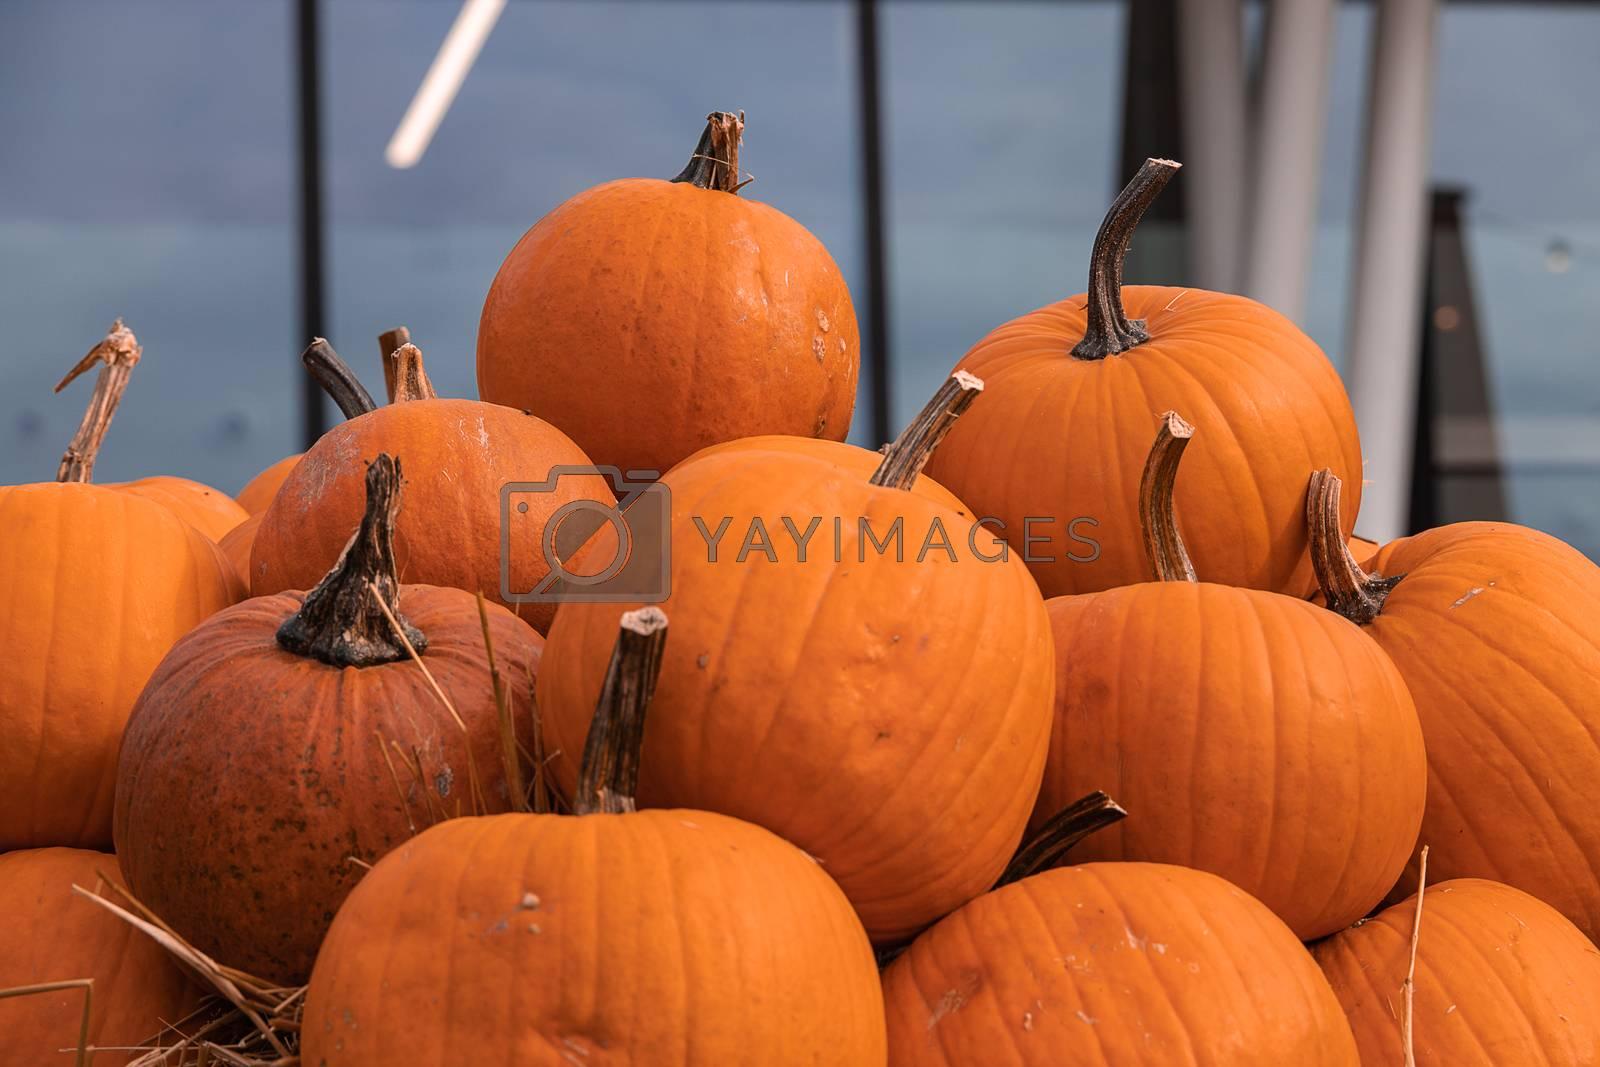 Royalty free image of big autumn orange pumpkins in an outdoor garden by Lukrecja